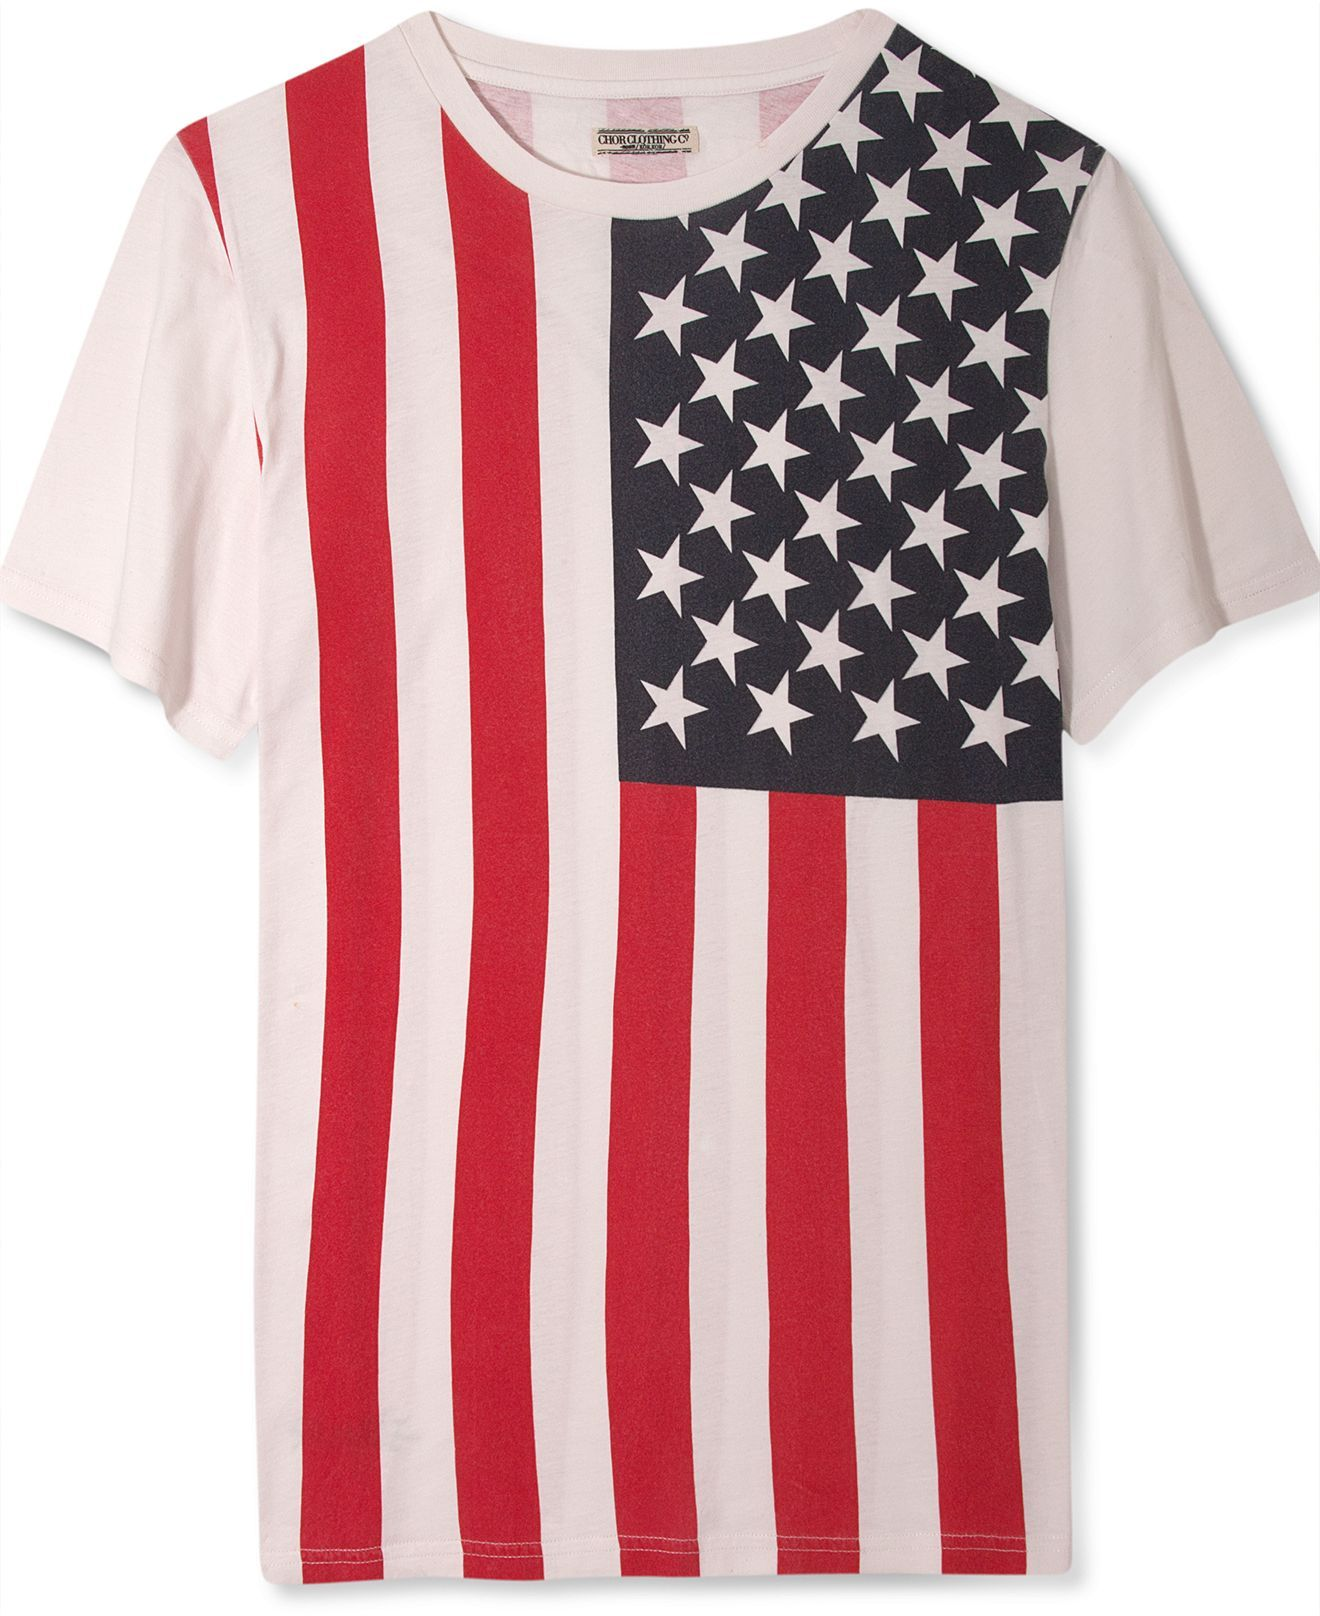 Chor shirt short sleeve american flag print t shirts men